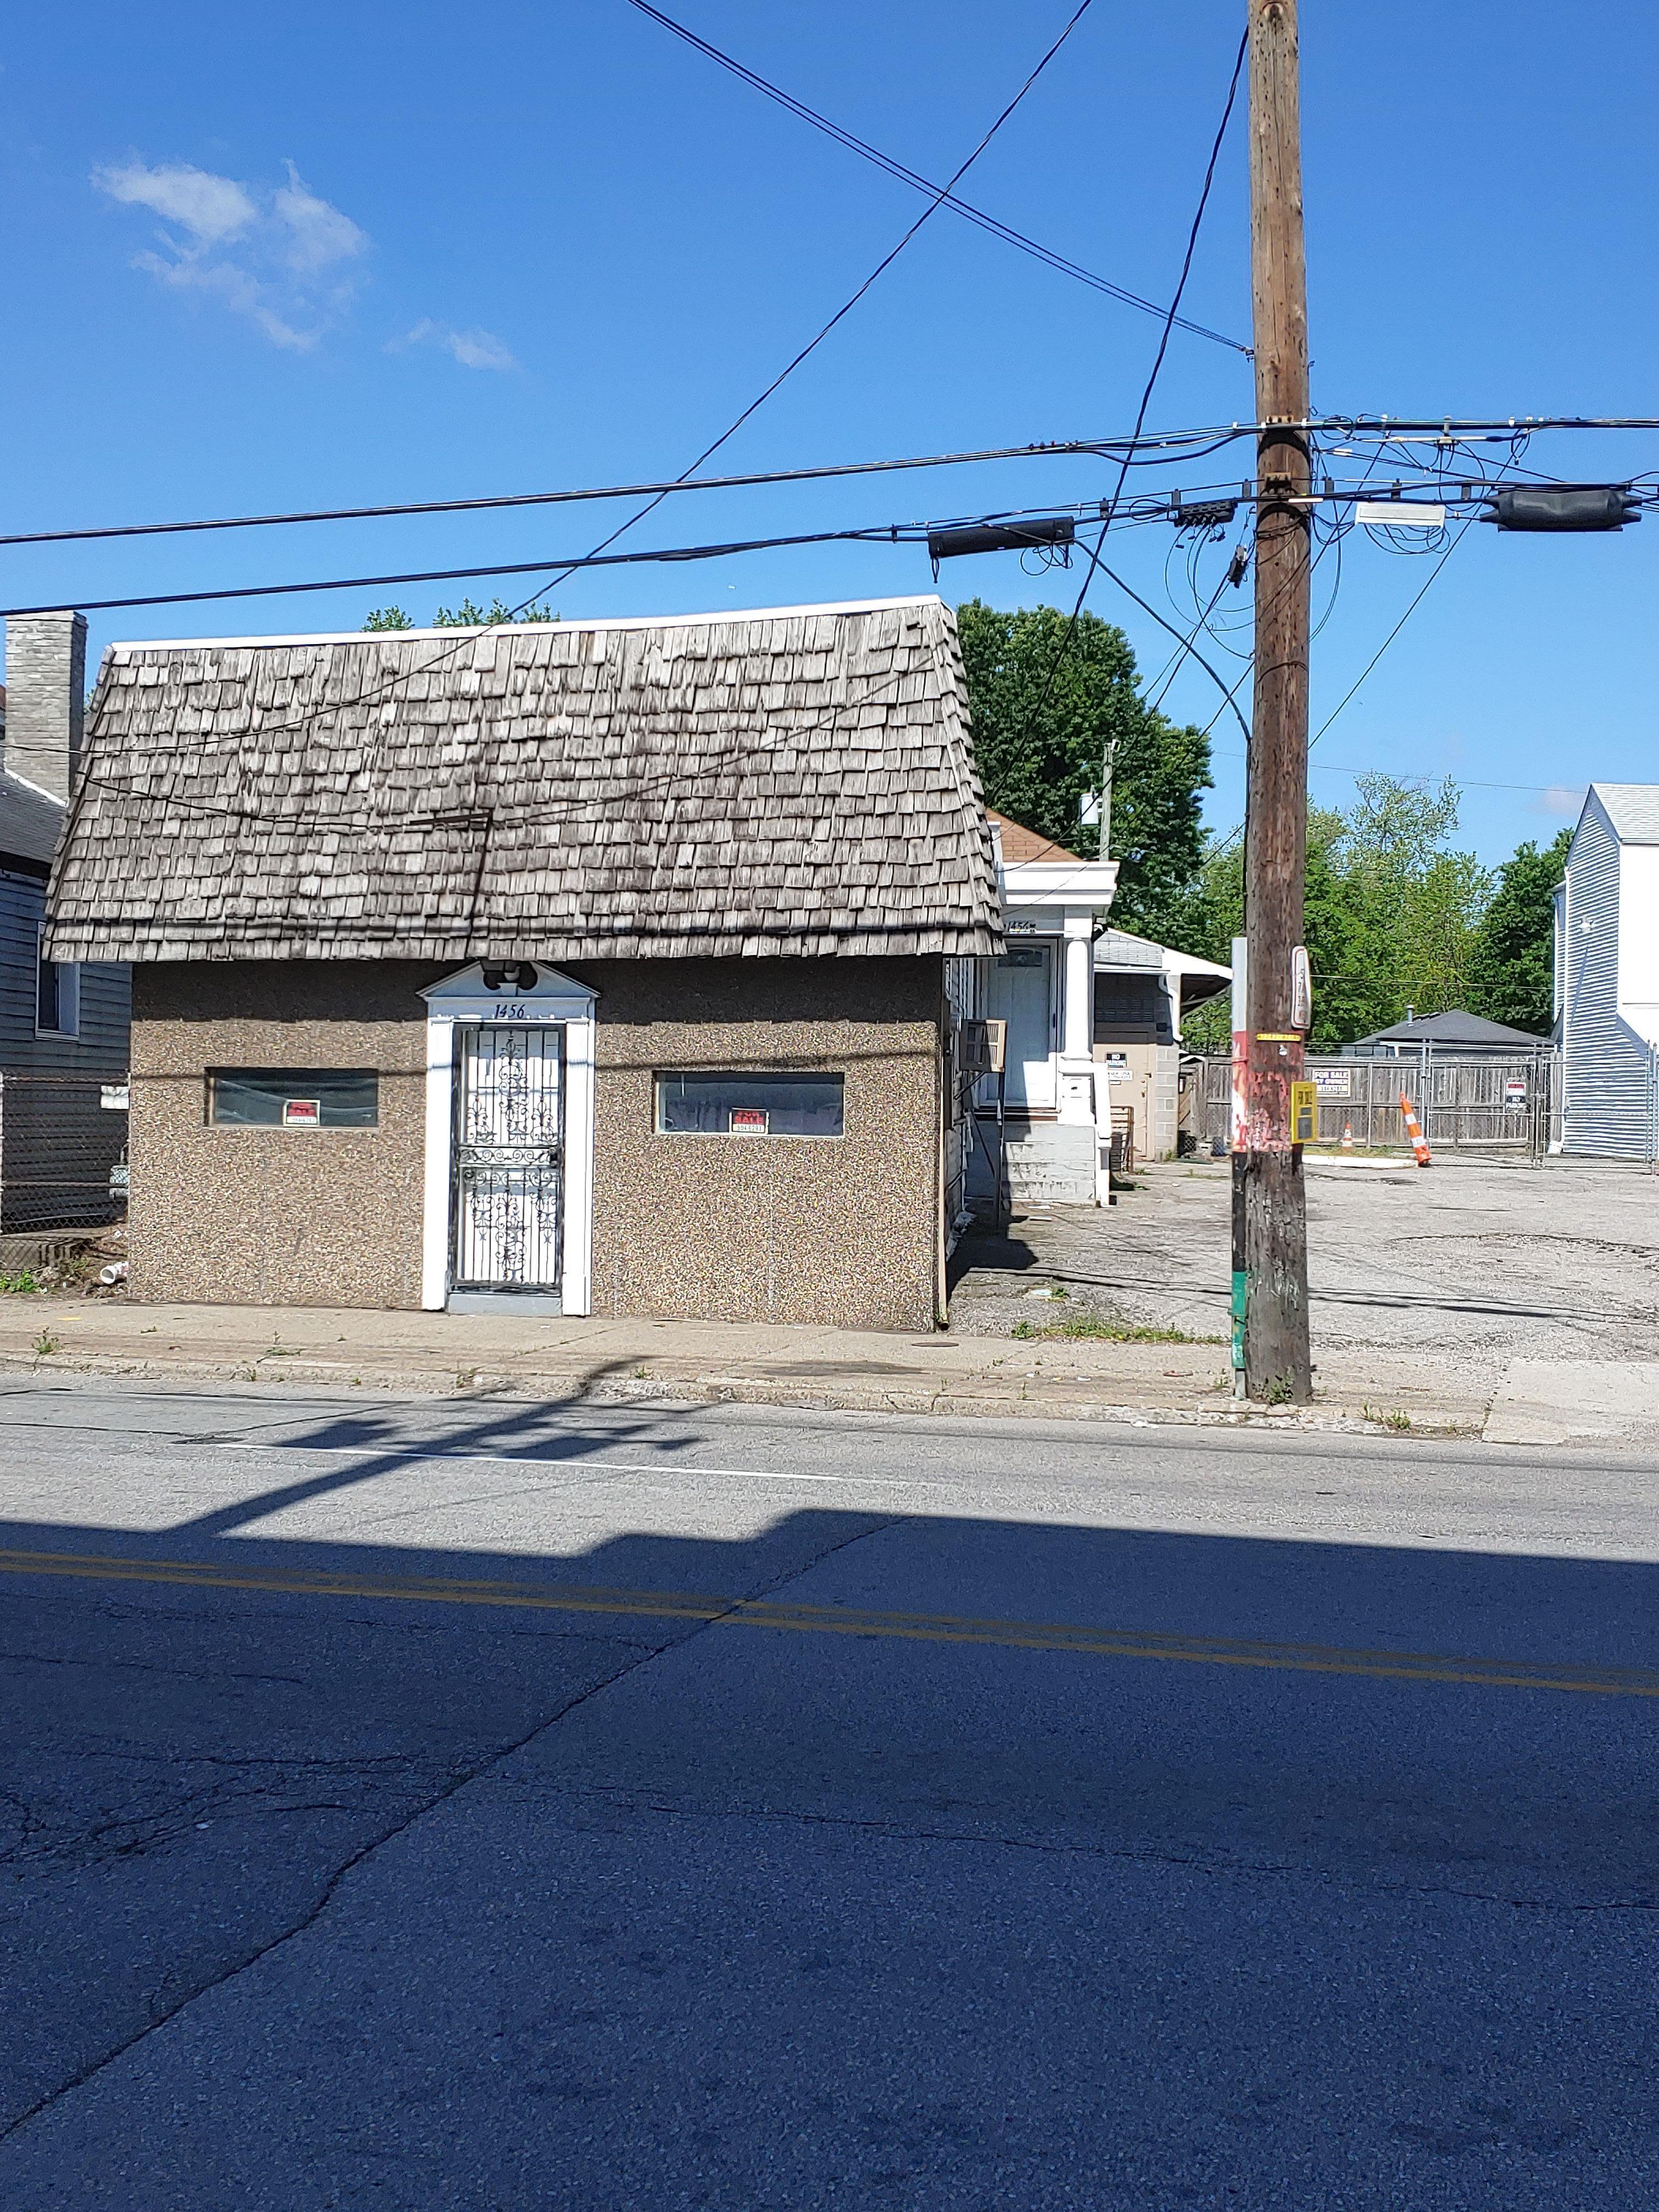 1456 S 7th St, Louisville, KY